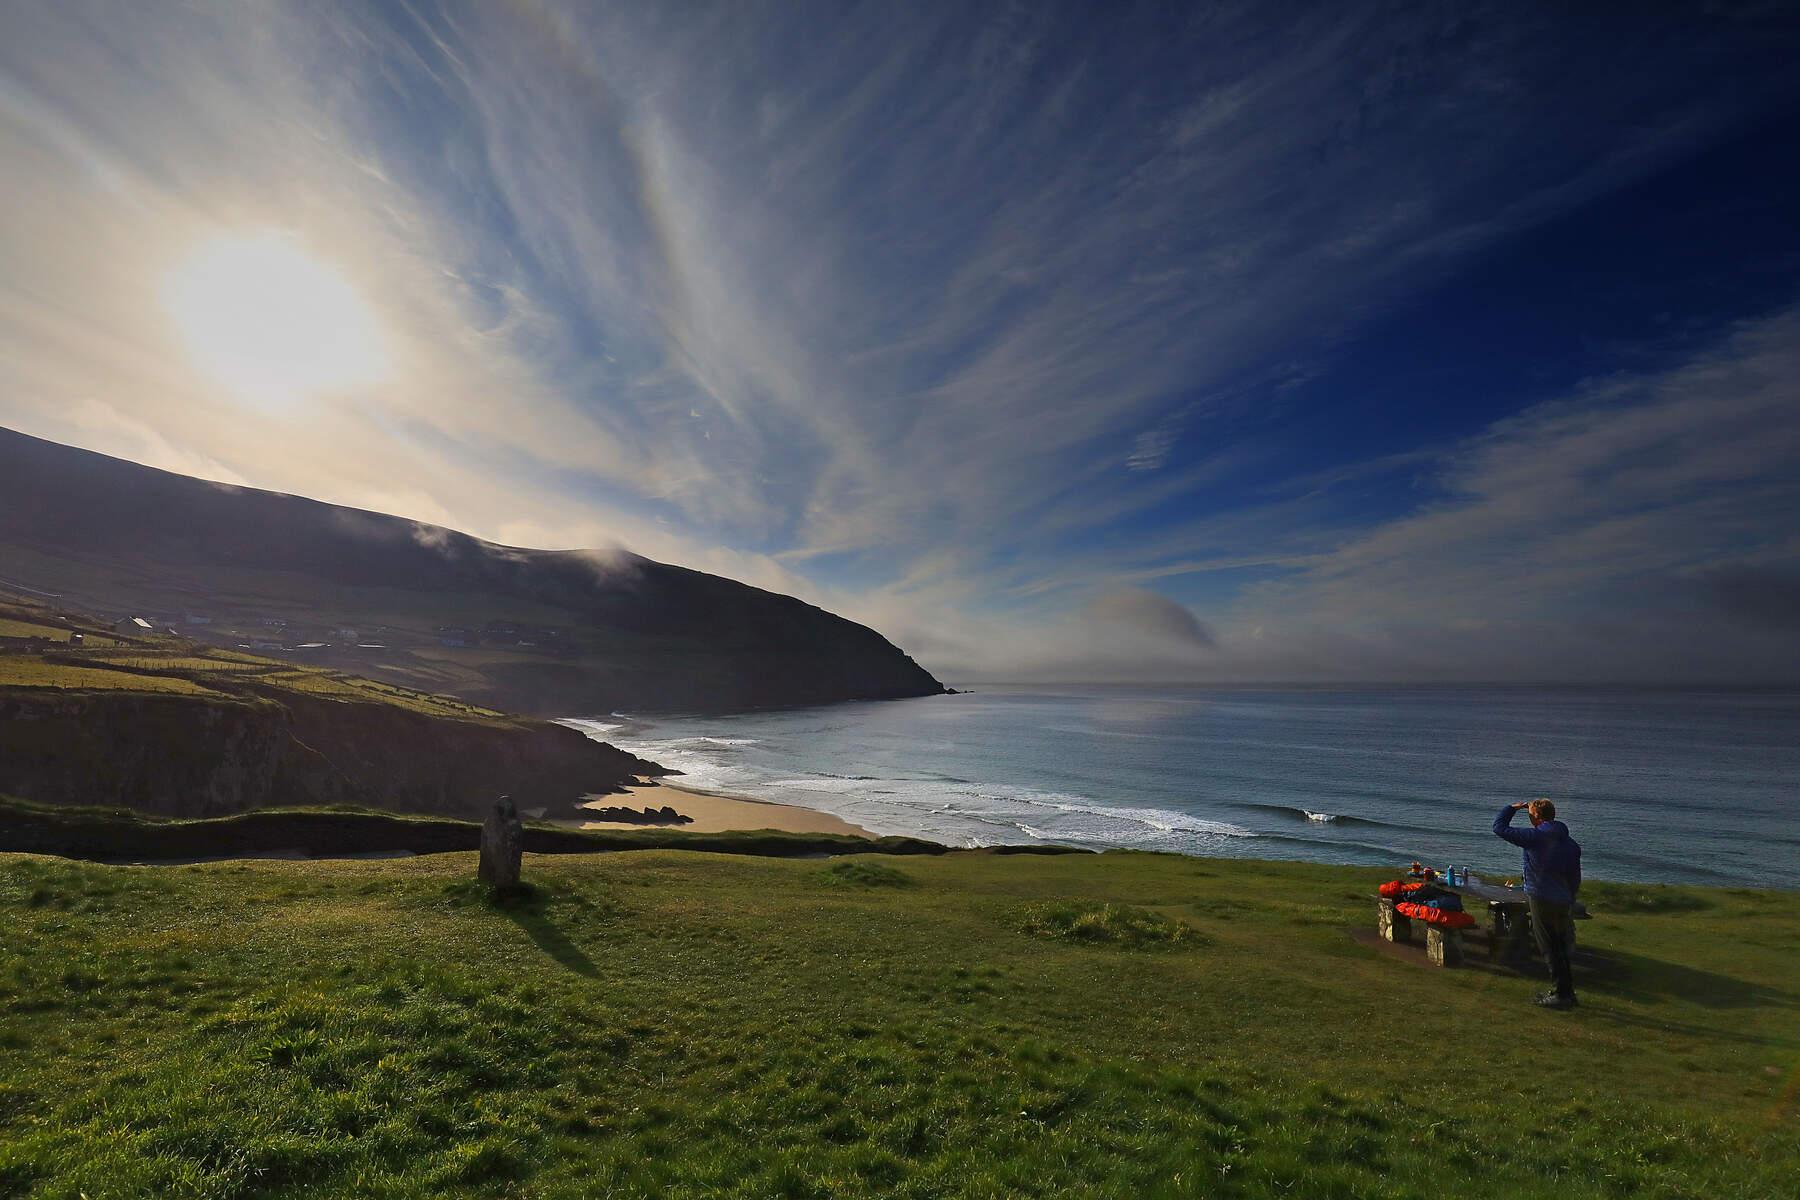 8 DAY WILD IRISH CASTLES EXPERIENCE